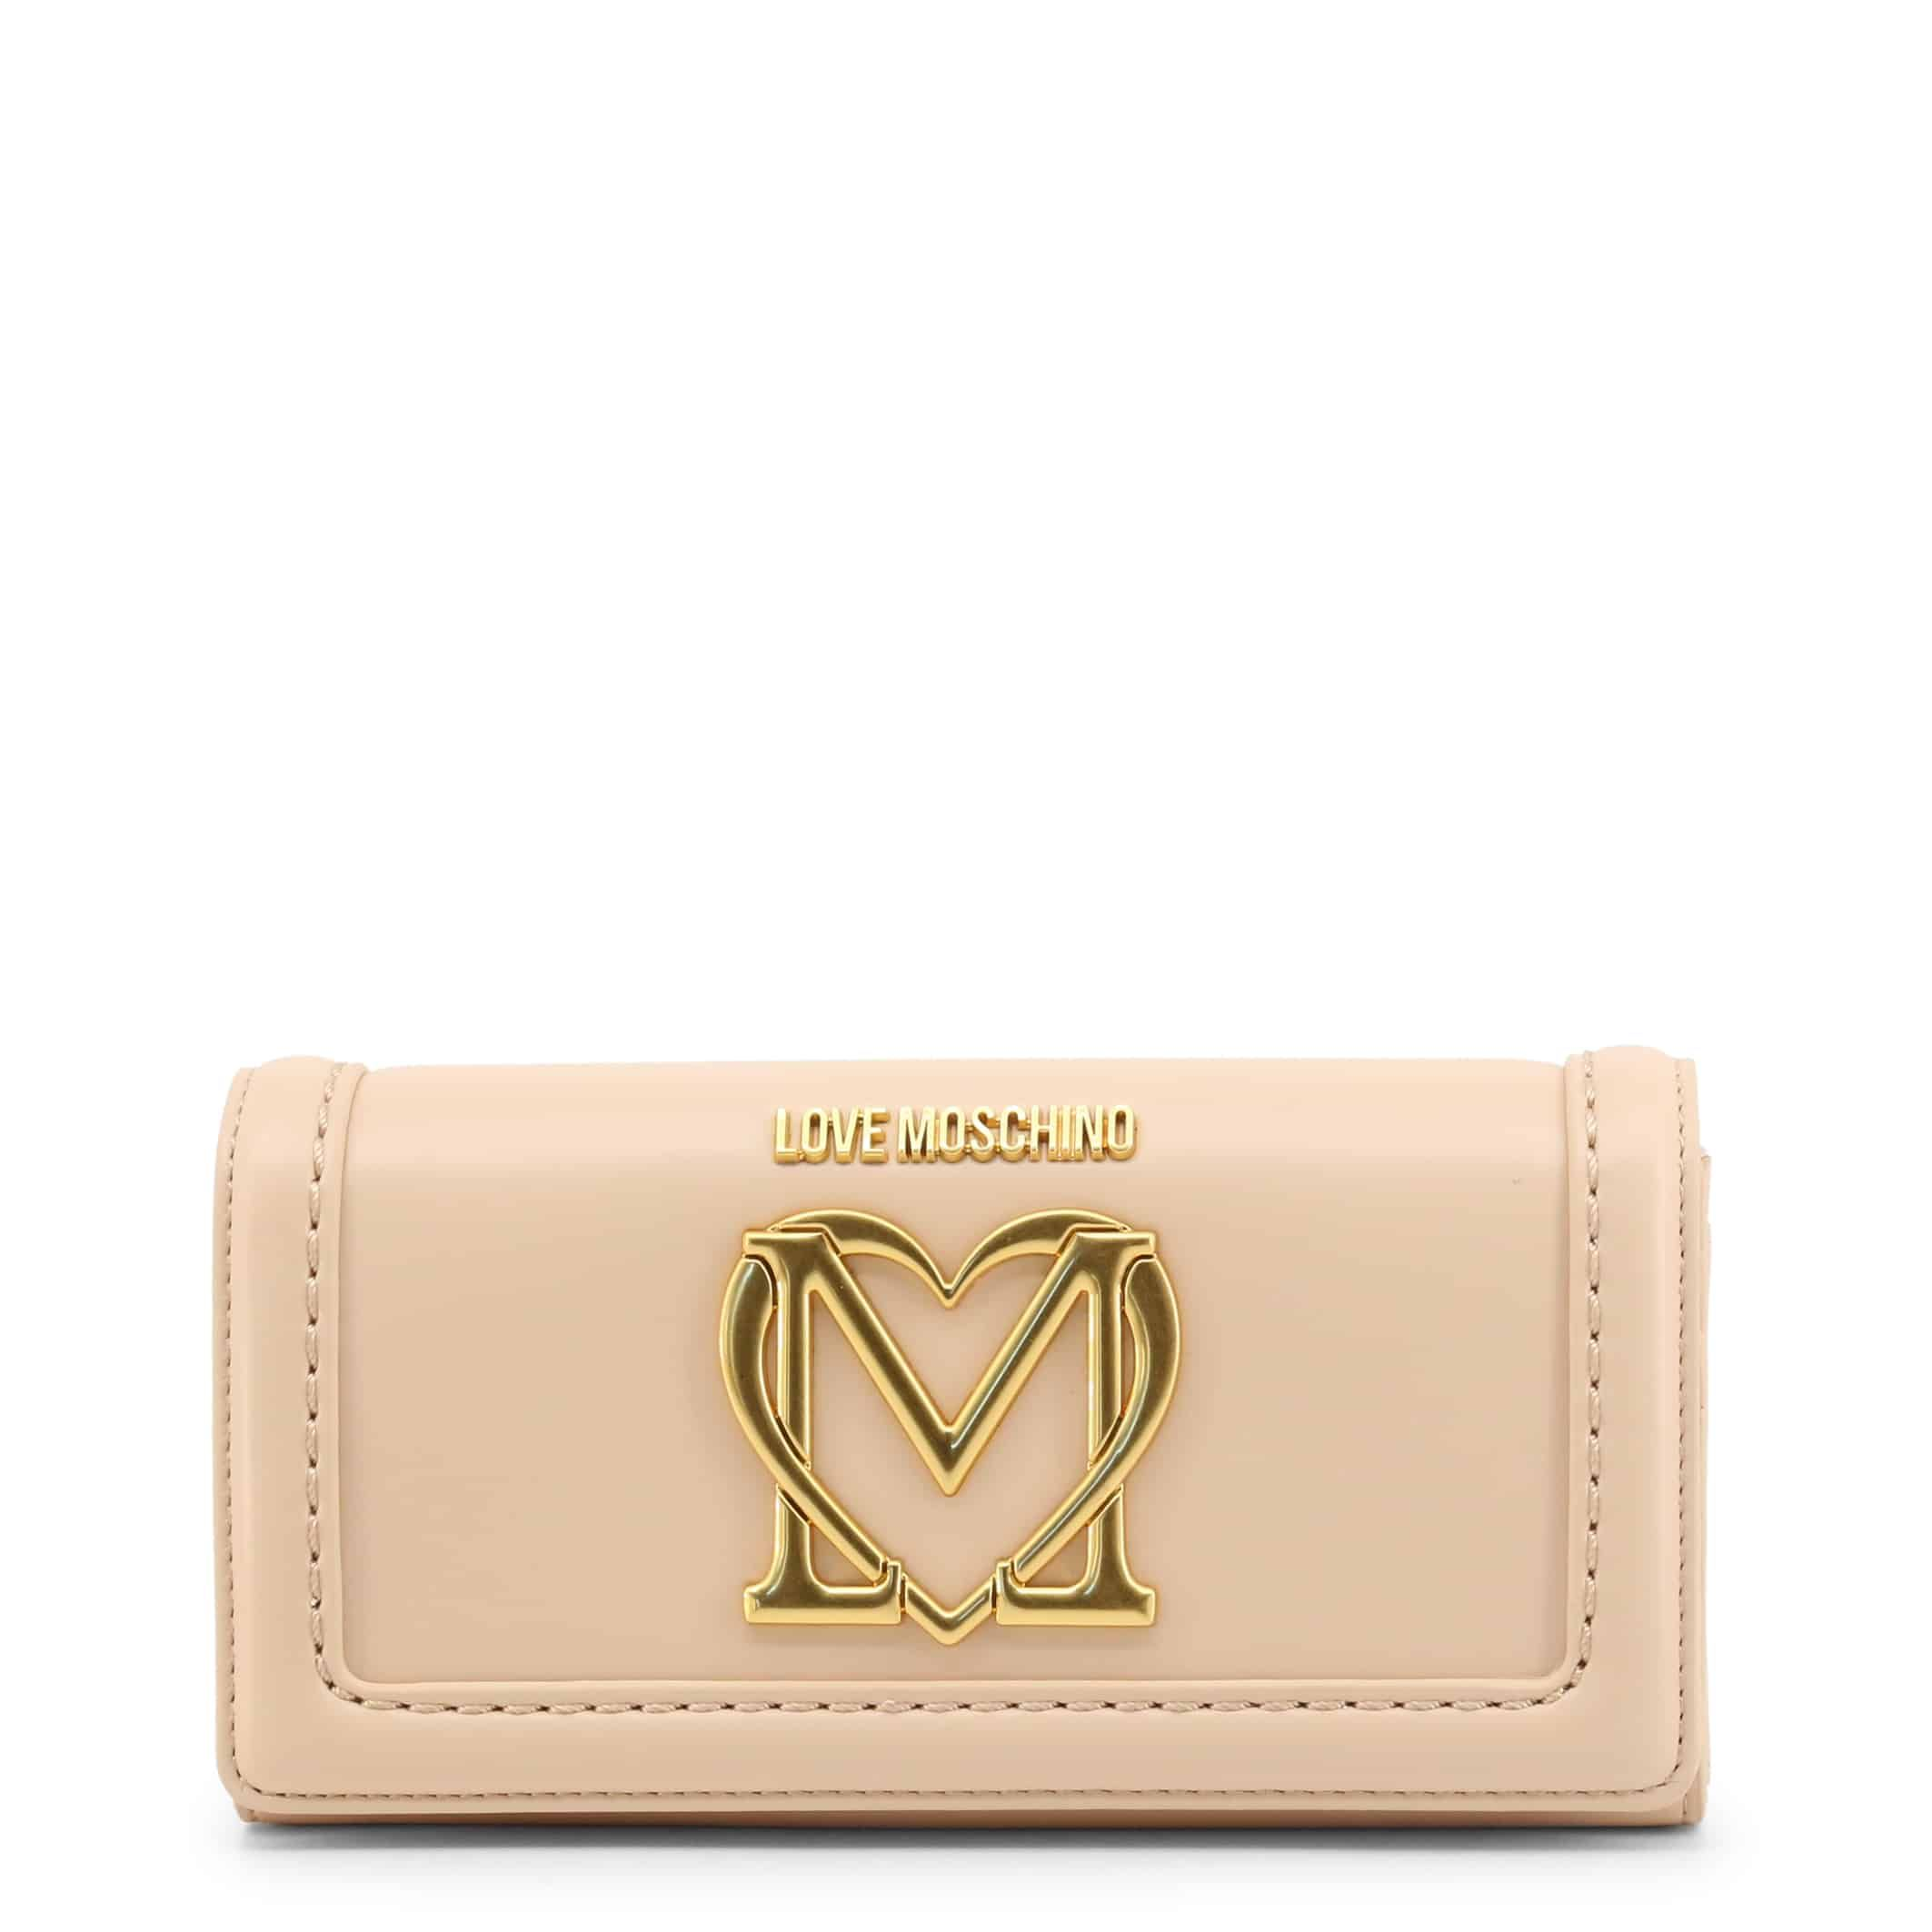 Love Moschino – JC5637PP0CKK0 – Roze Designeritems.nl